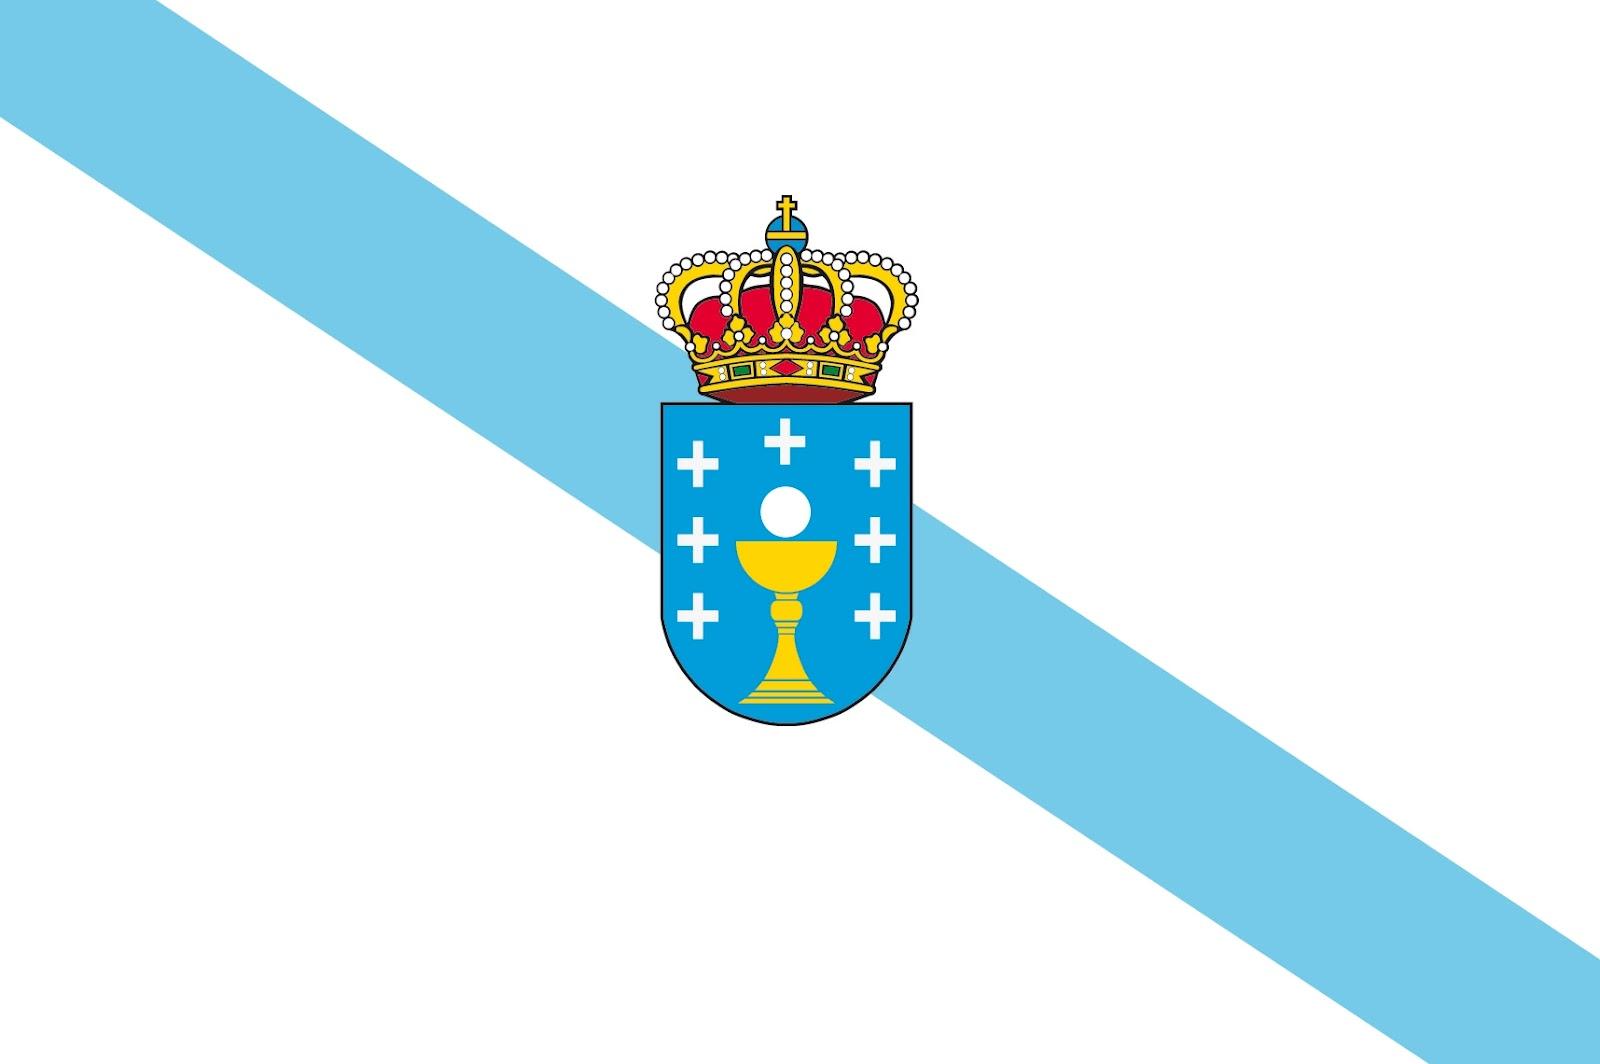 Casas prefabricadas en galicia empresas fabricantes y for Casas prefabricadas galicia